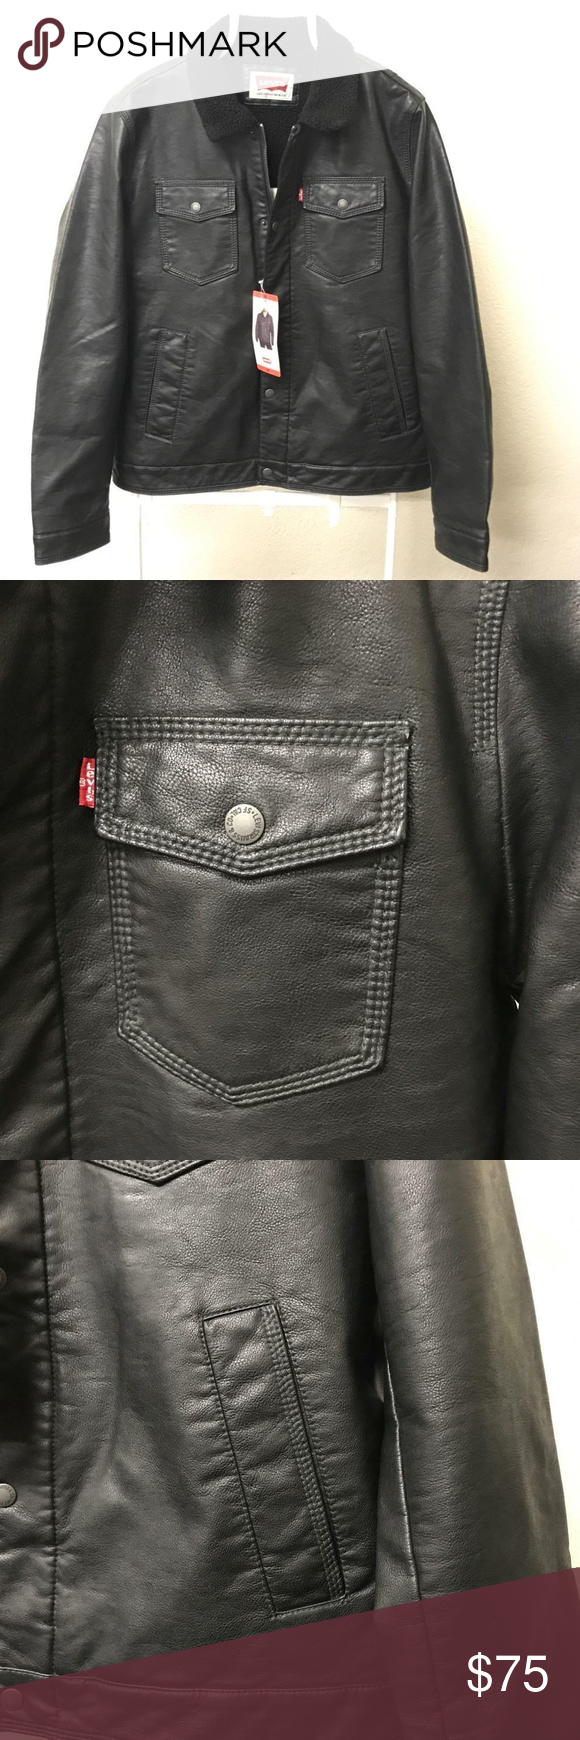 Levi's Mens Faux Leather Trucker Jacket Black Fashion